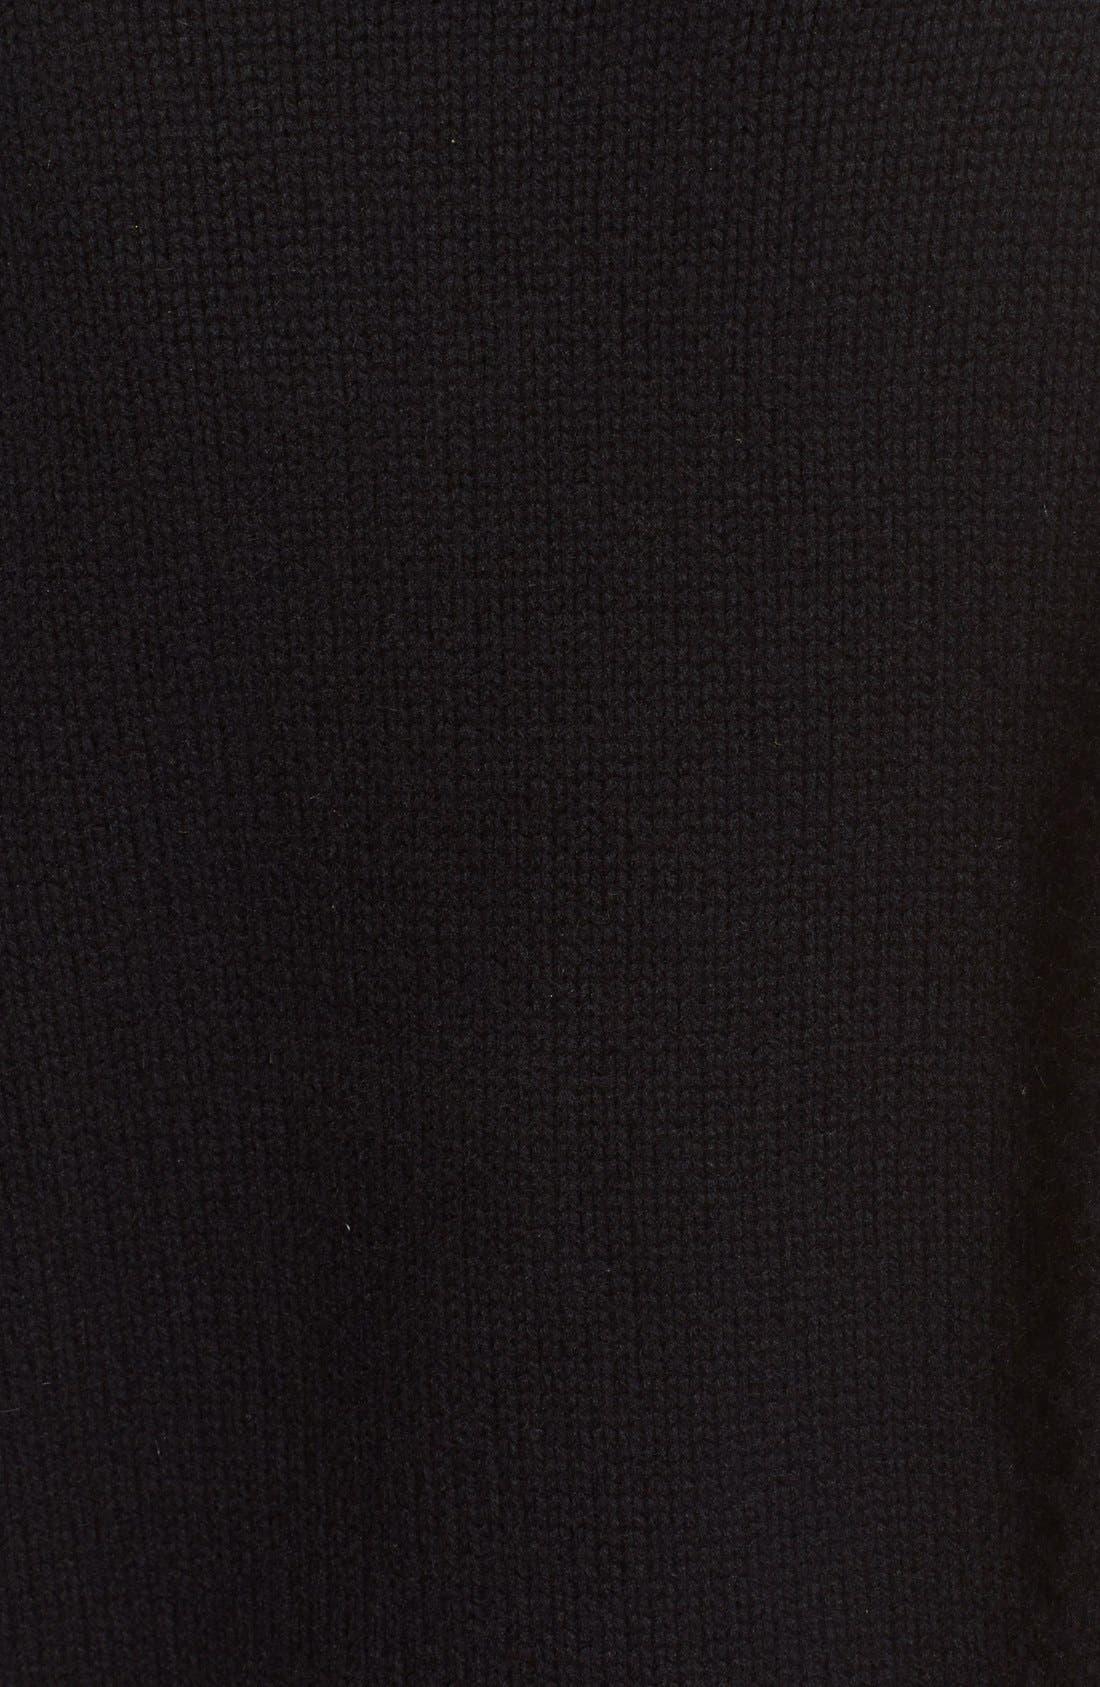 Alternate Image 3  - ACNE Studios 'Shora' Wool & Cashmere Sweater